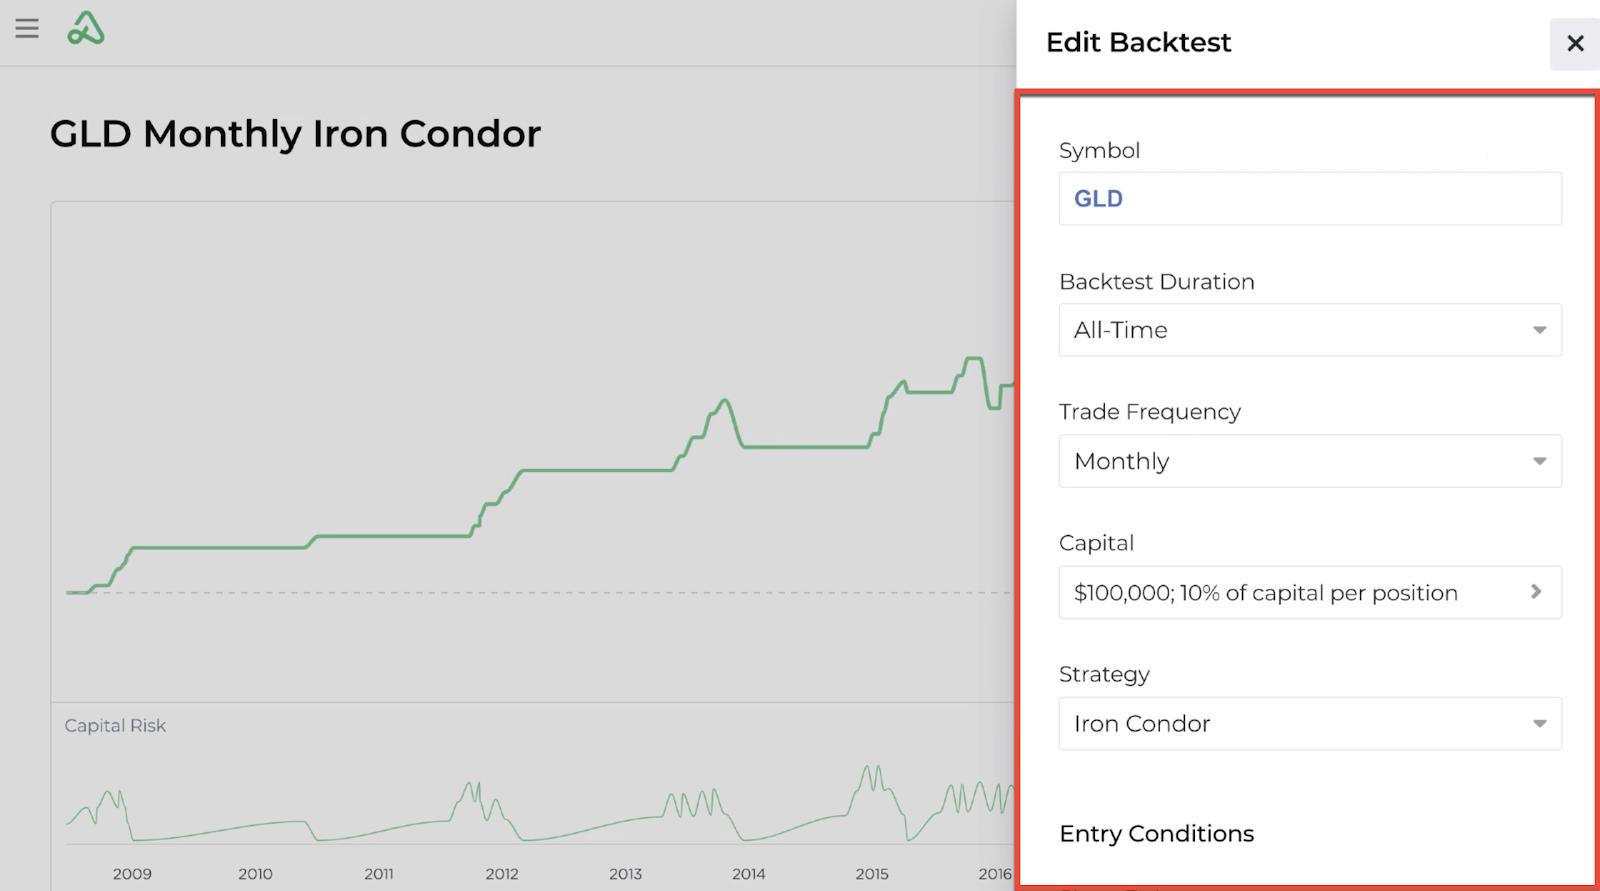 Screenshot of the edit backtest input display